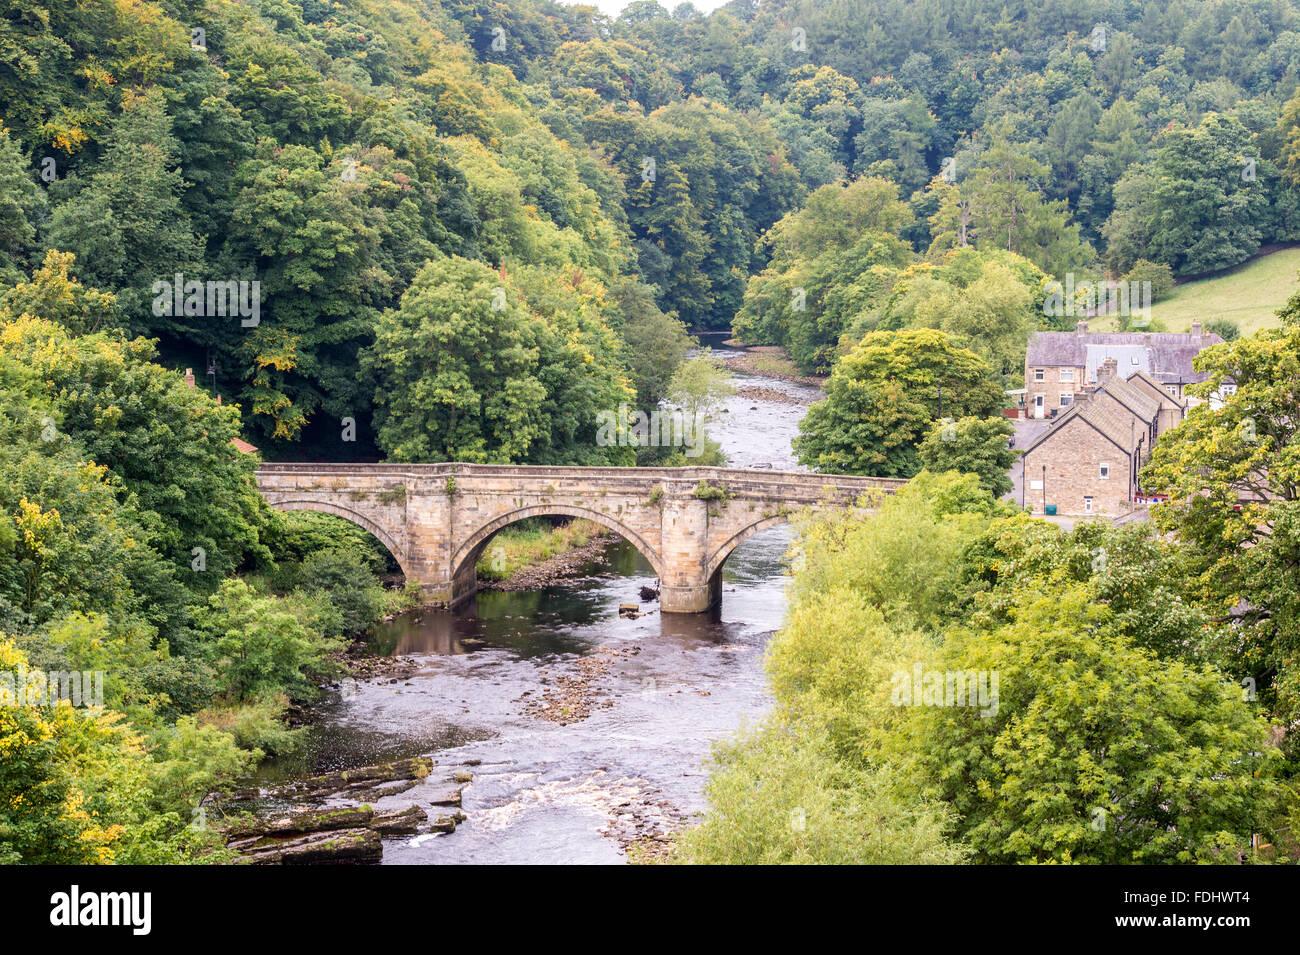 Bridge in Richmond, Yorkshire, England, UK. - Stock Image